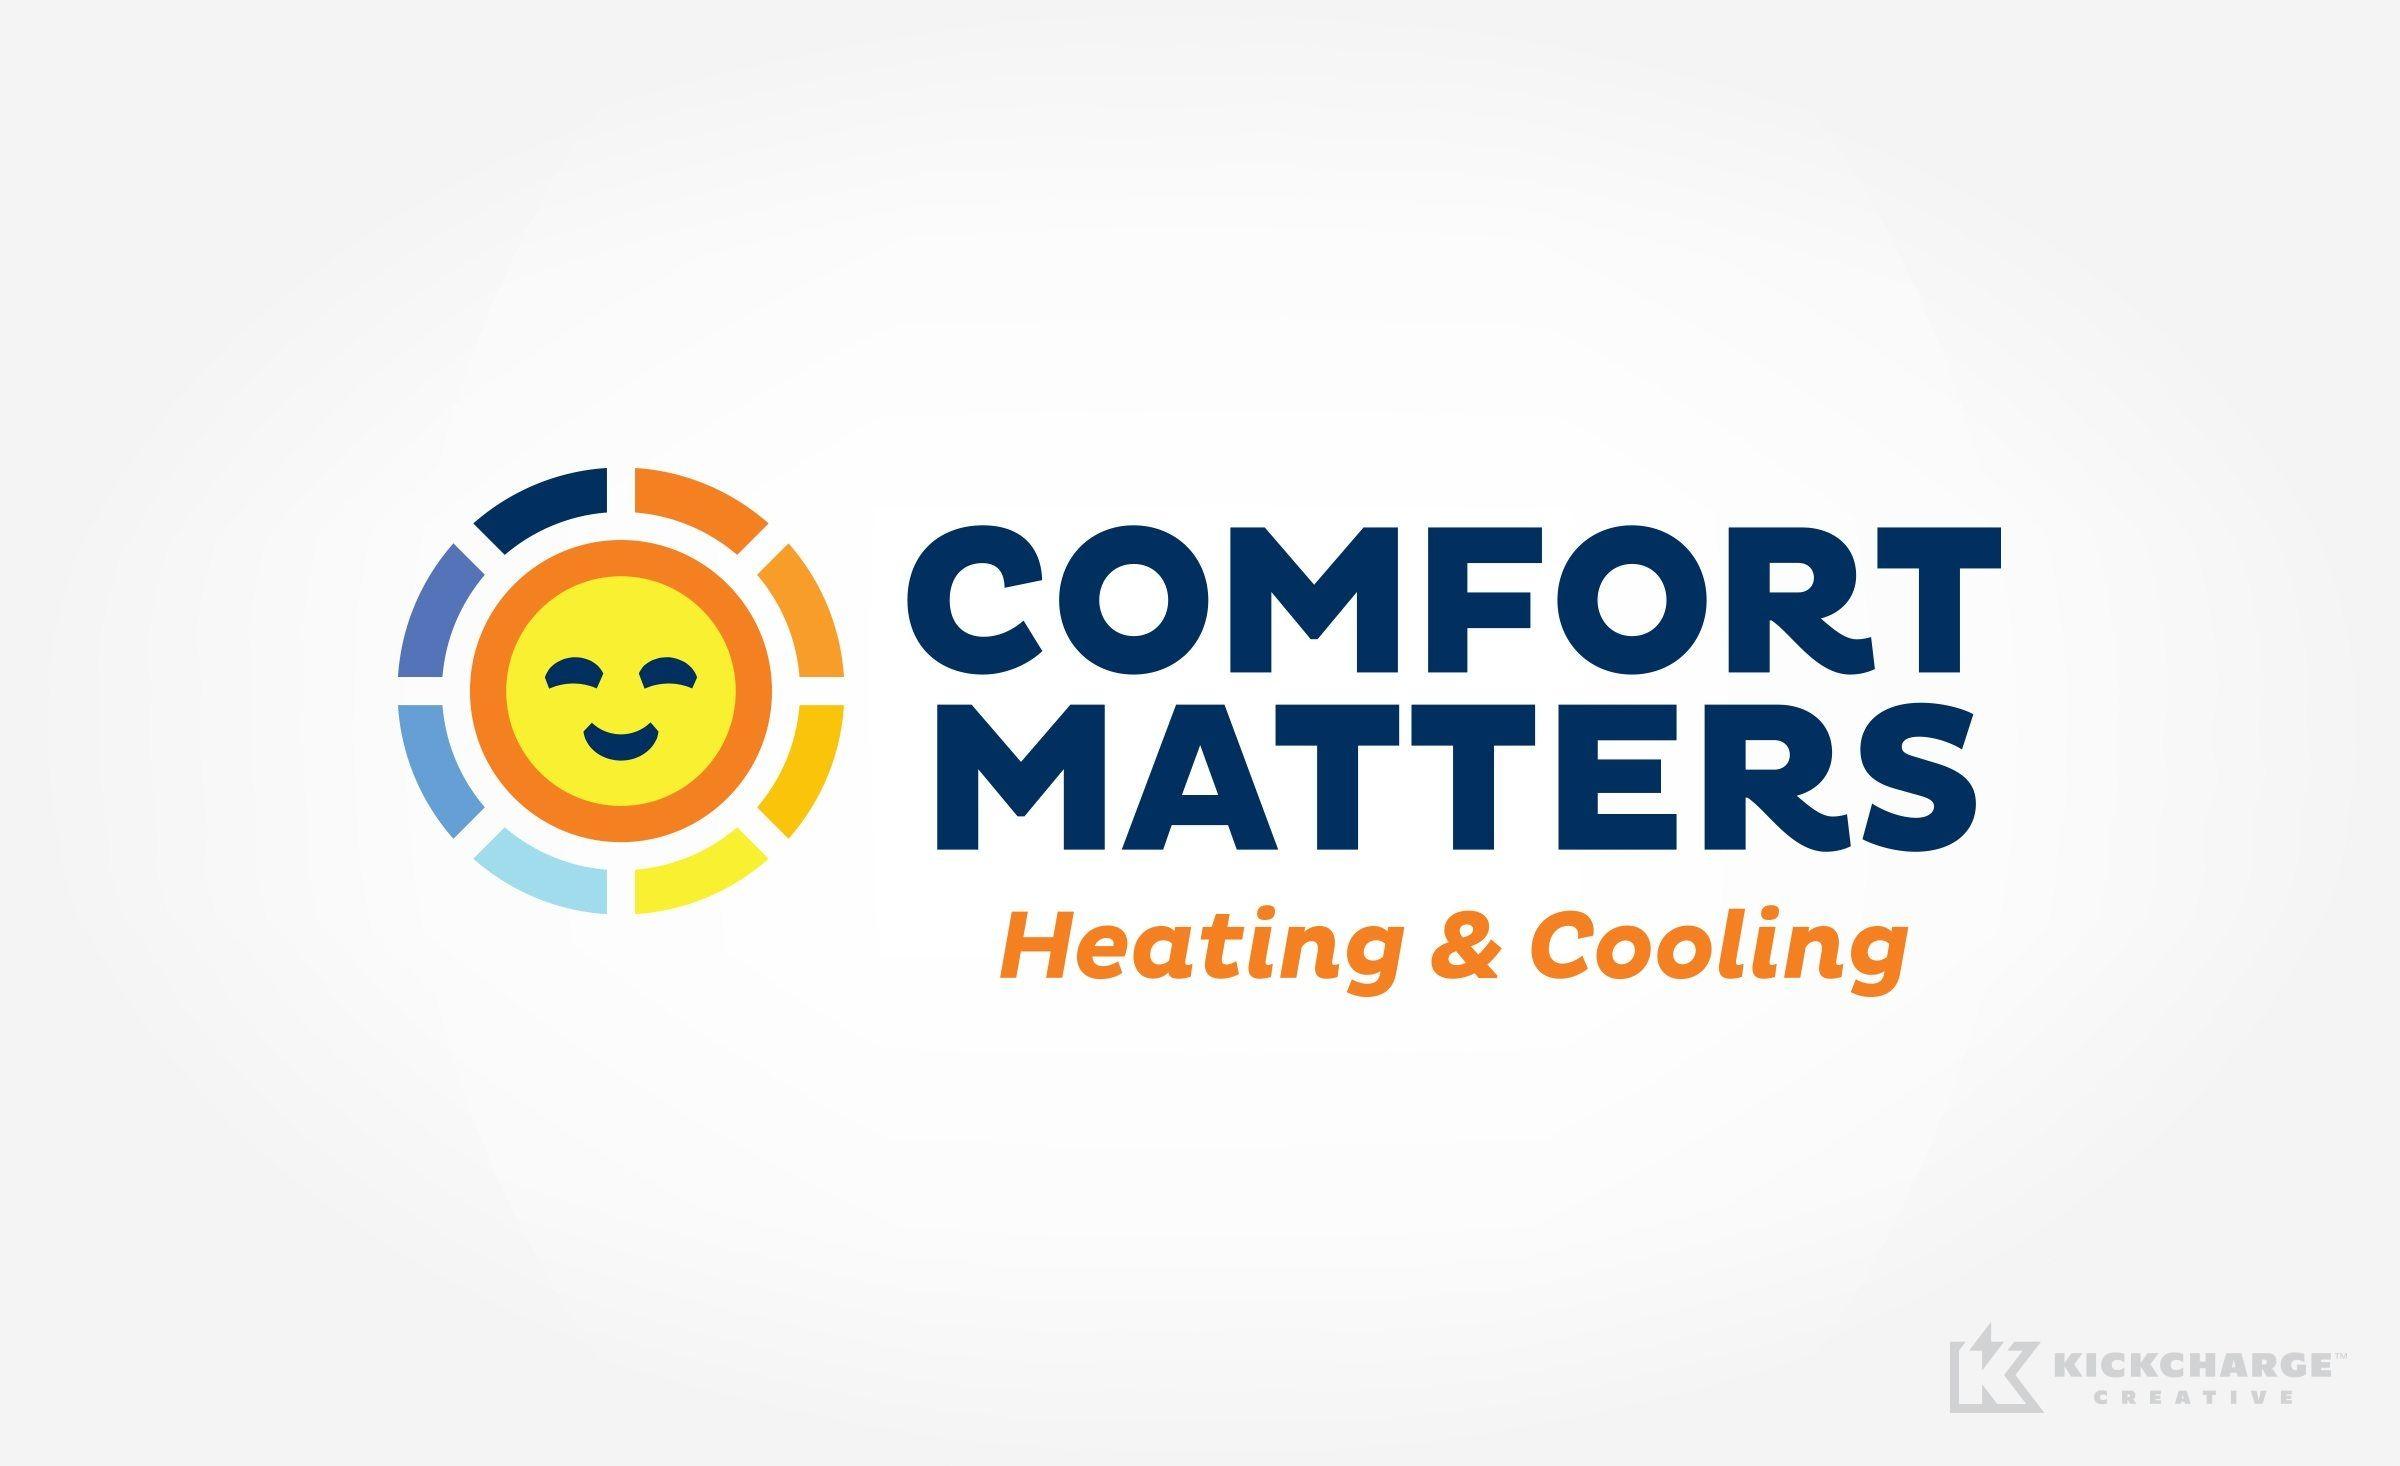 Comfort Matters Kickcharge Creative Small Business Logo